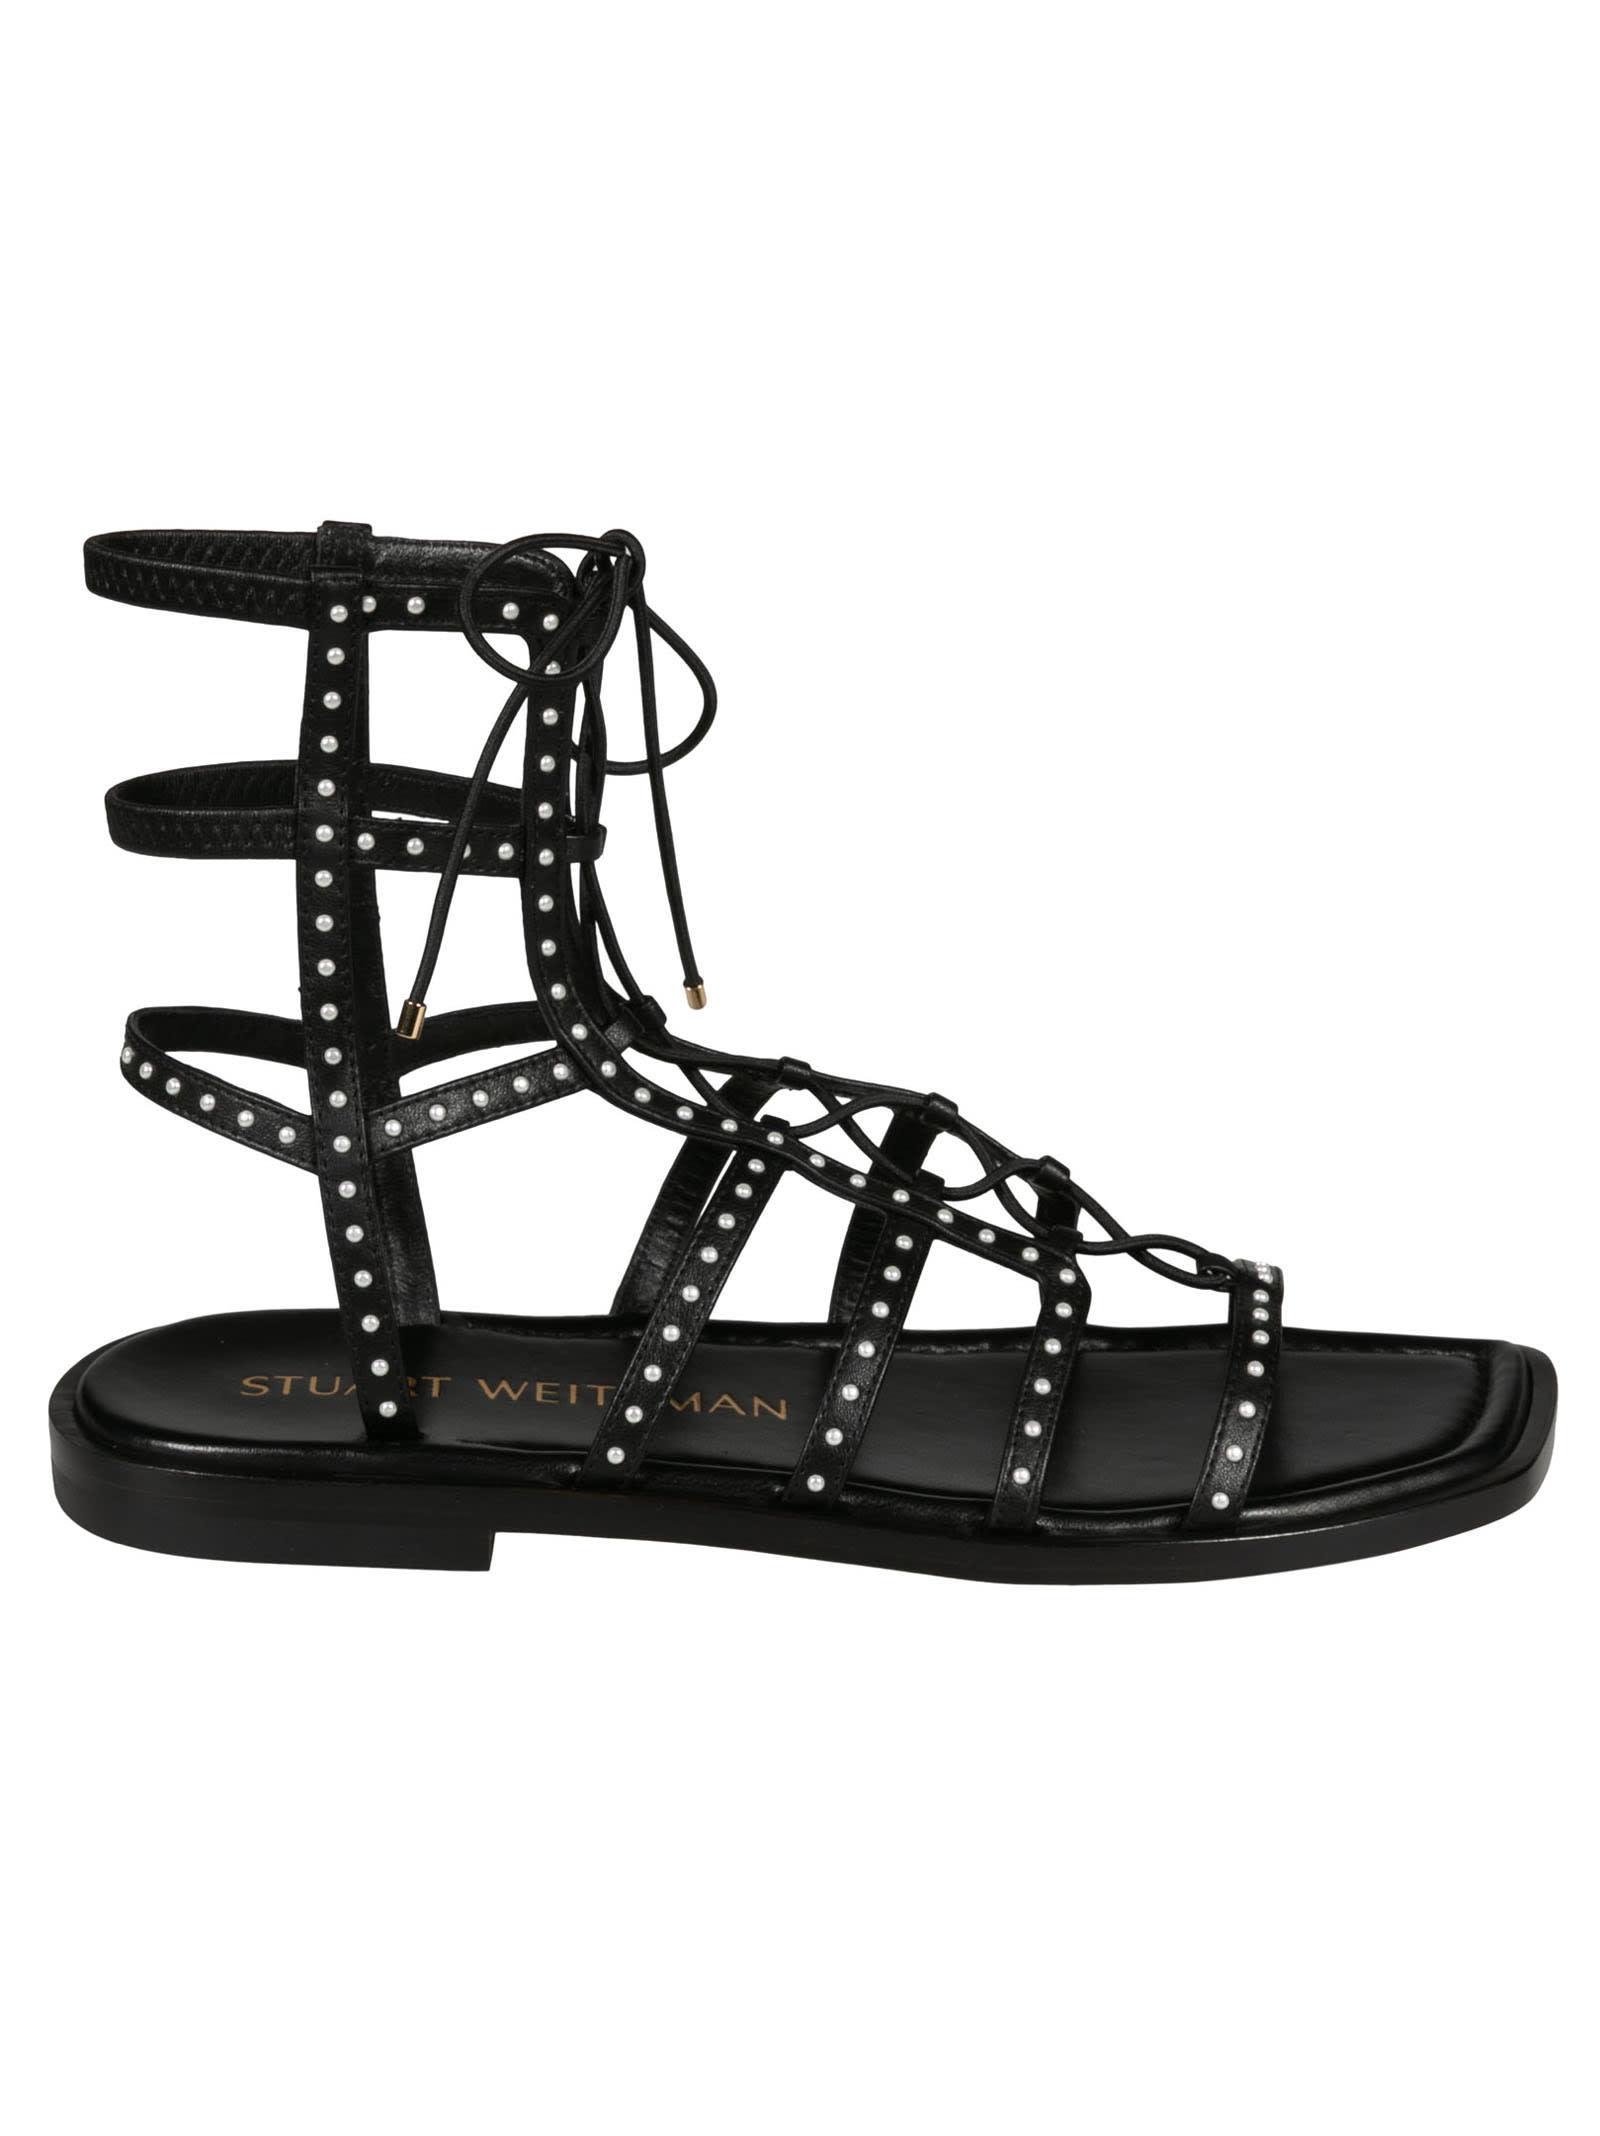 Buy Stuart Weitzman Kora Lace Up Sandals online, shop Stuart Weitzman shoes with free shipping